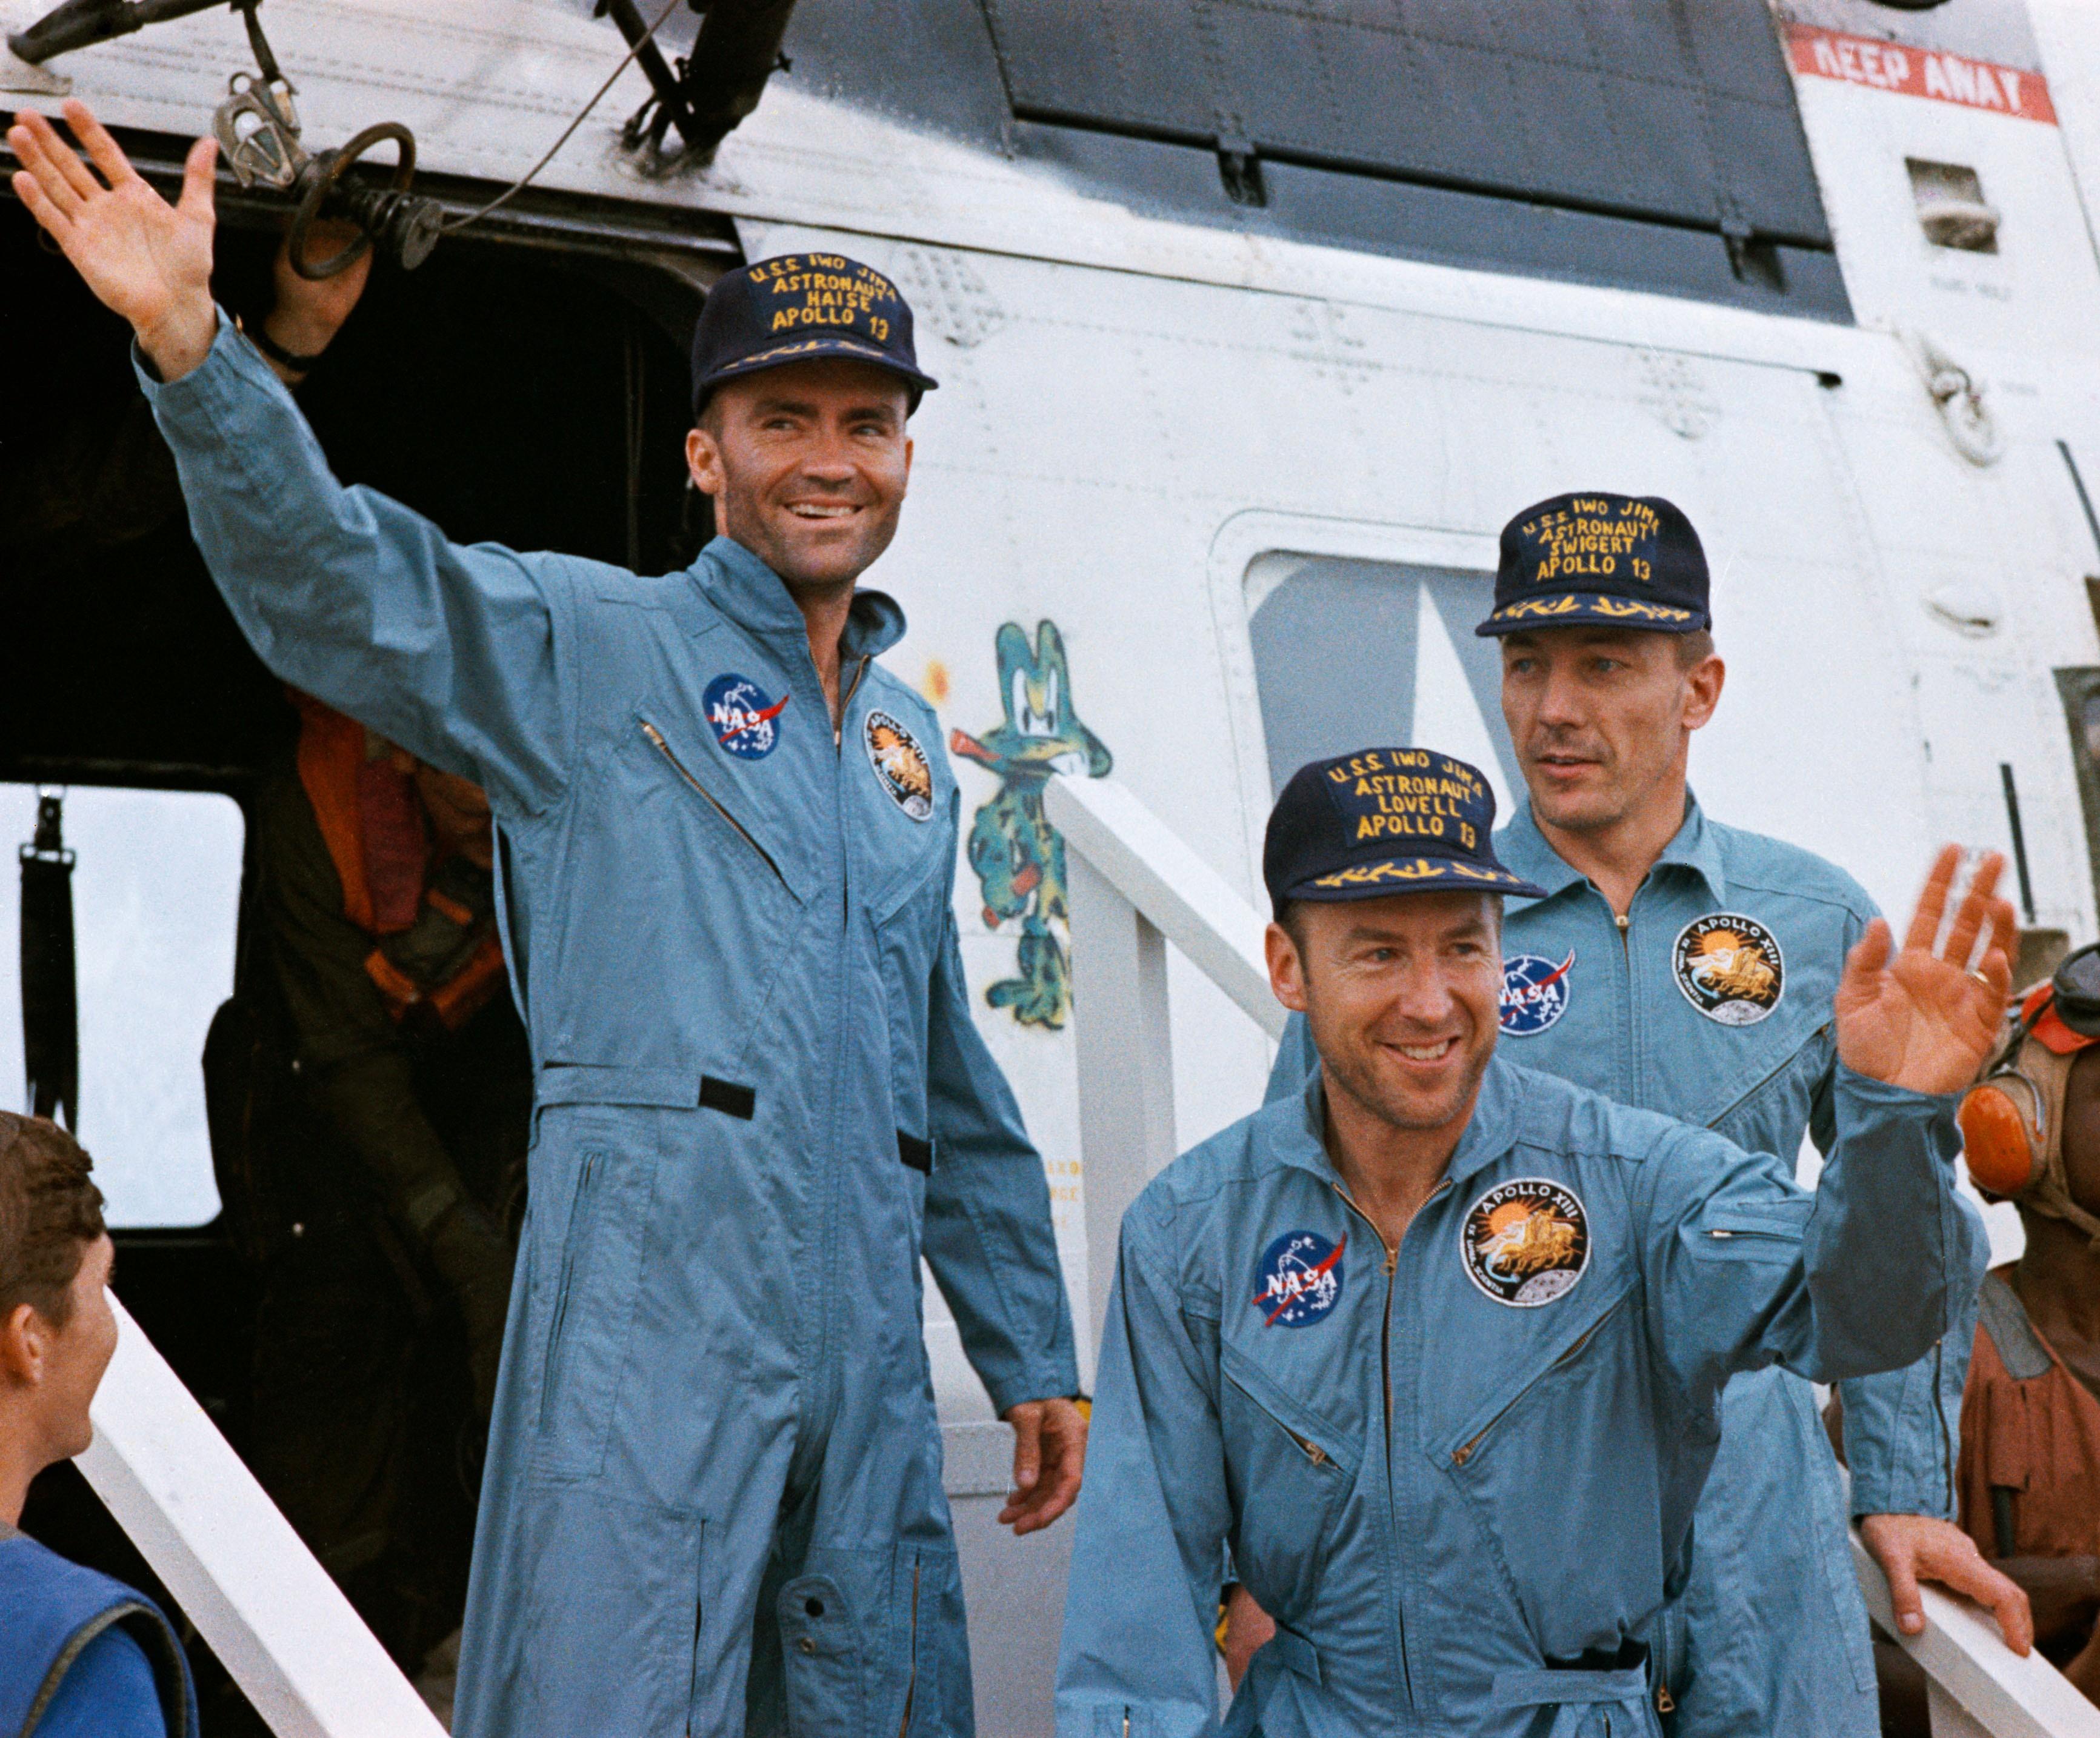 50 Years Ago: Apollo 13 Crew Returns Safely to Earth